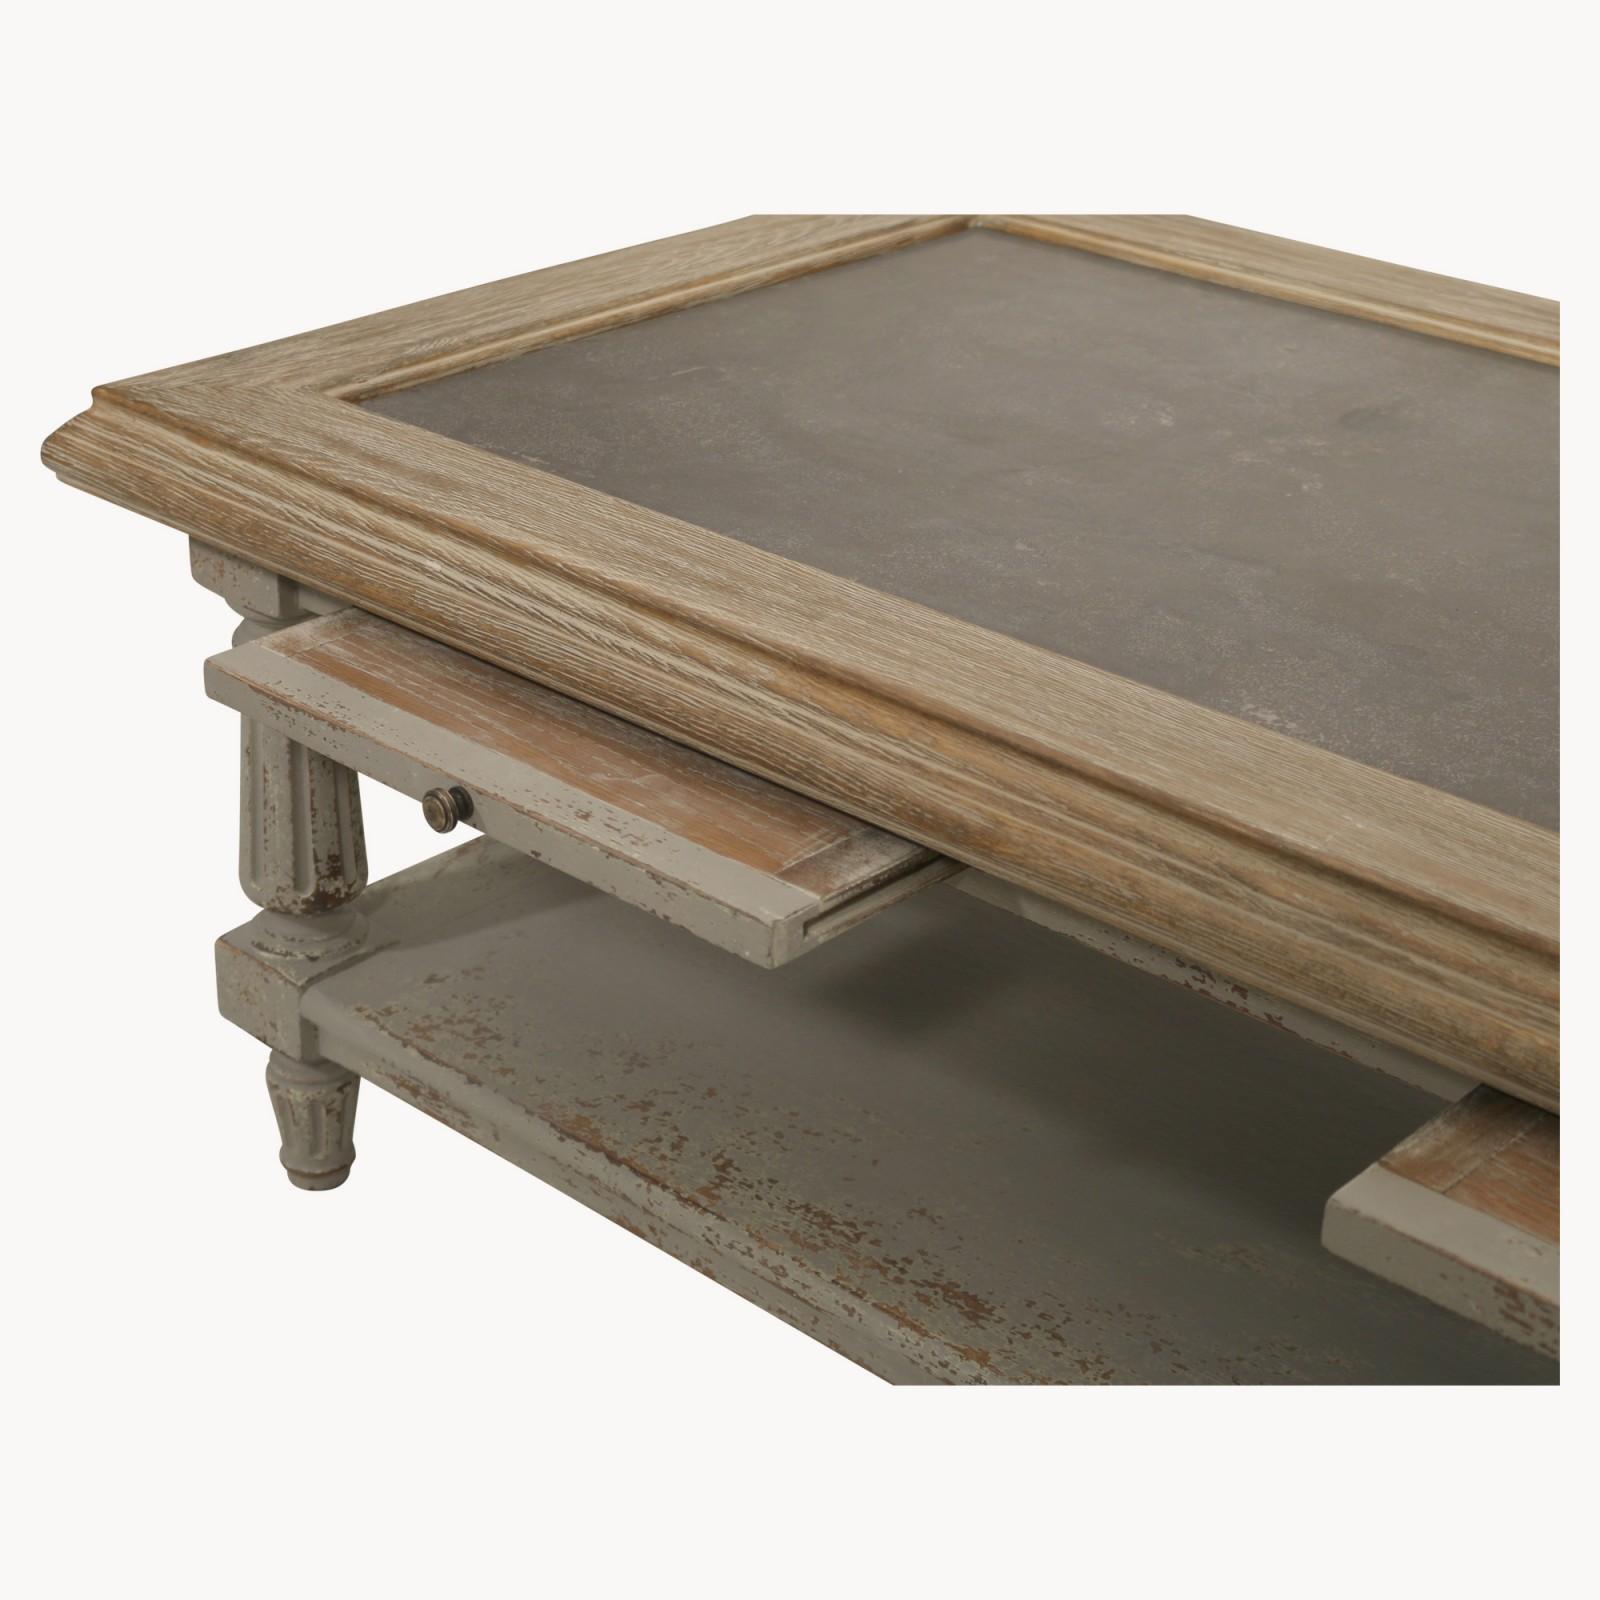 Oak And Stone Coffee Table: Colonial Grey Oak And Stone Coffee Table